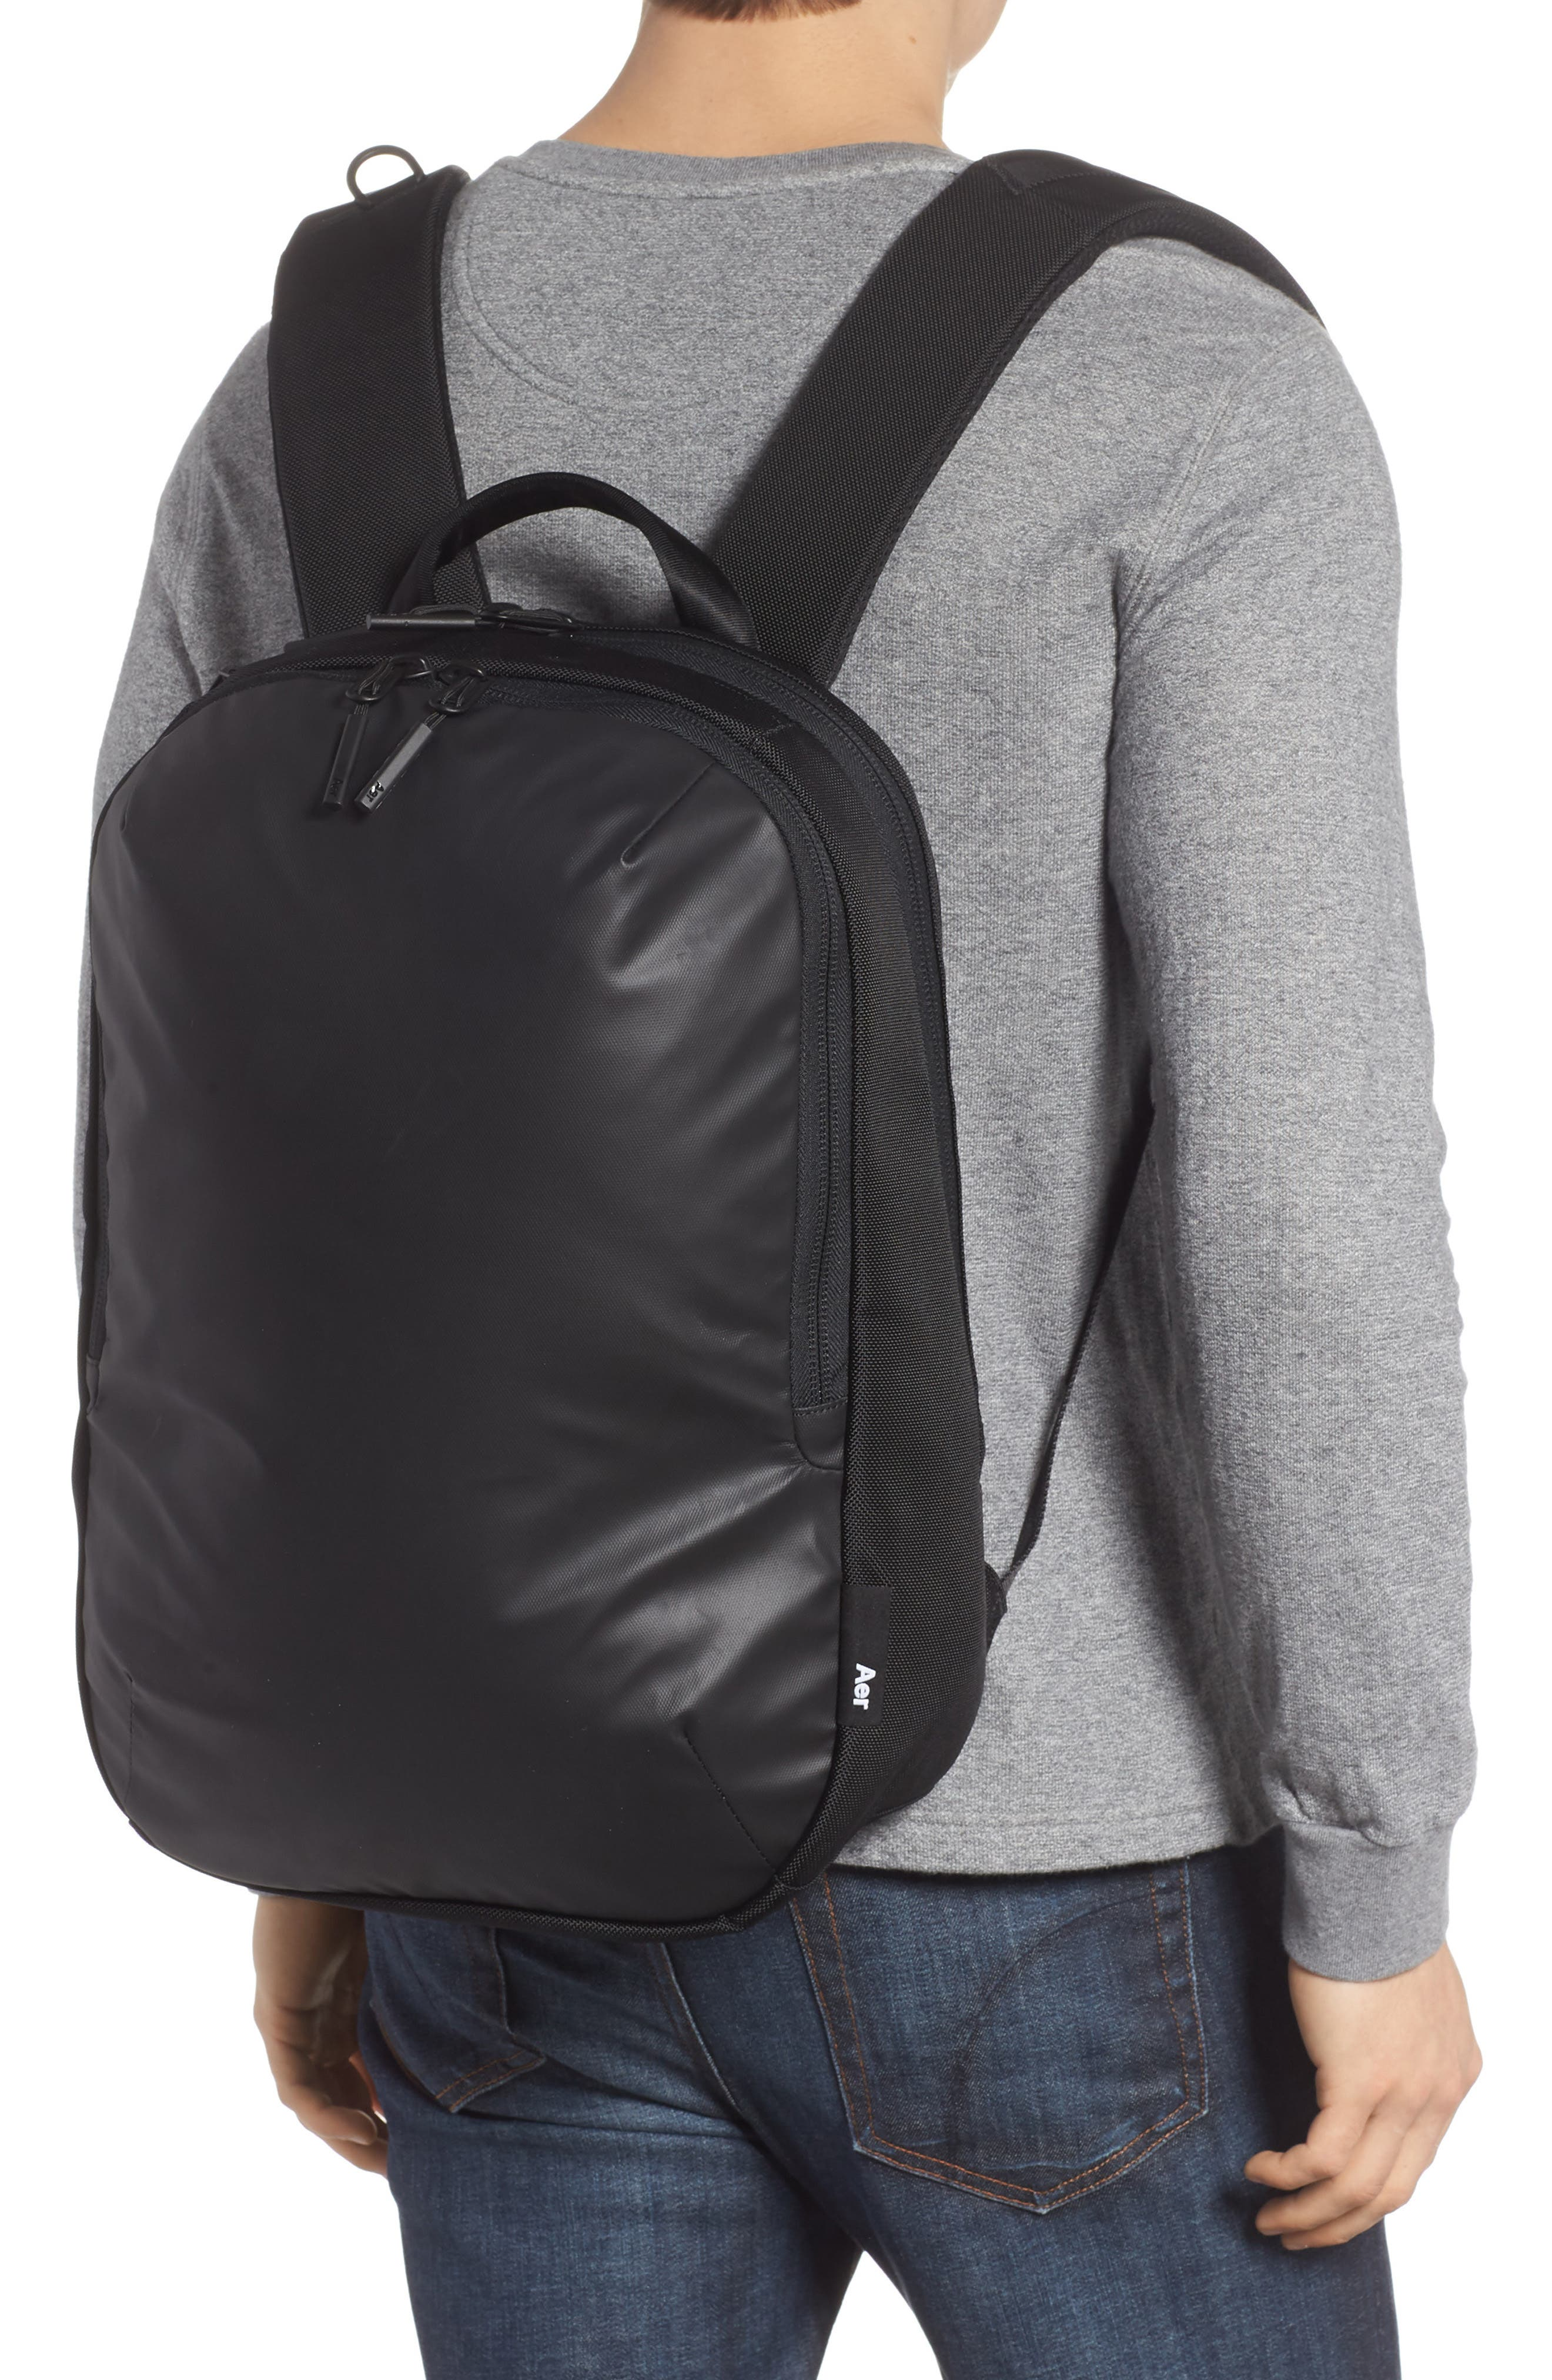 Work Day Backpack,                             Alternate thumbnail 2, color,                             Black